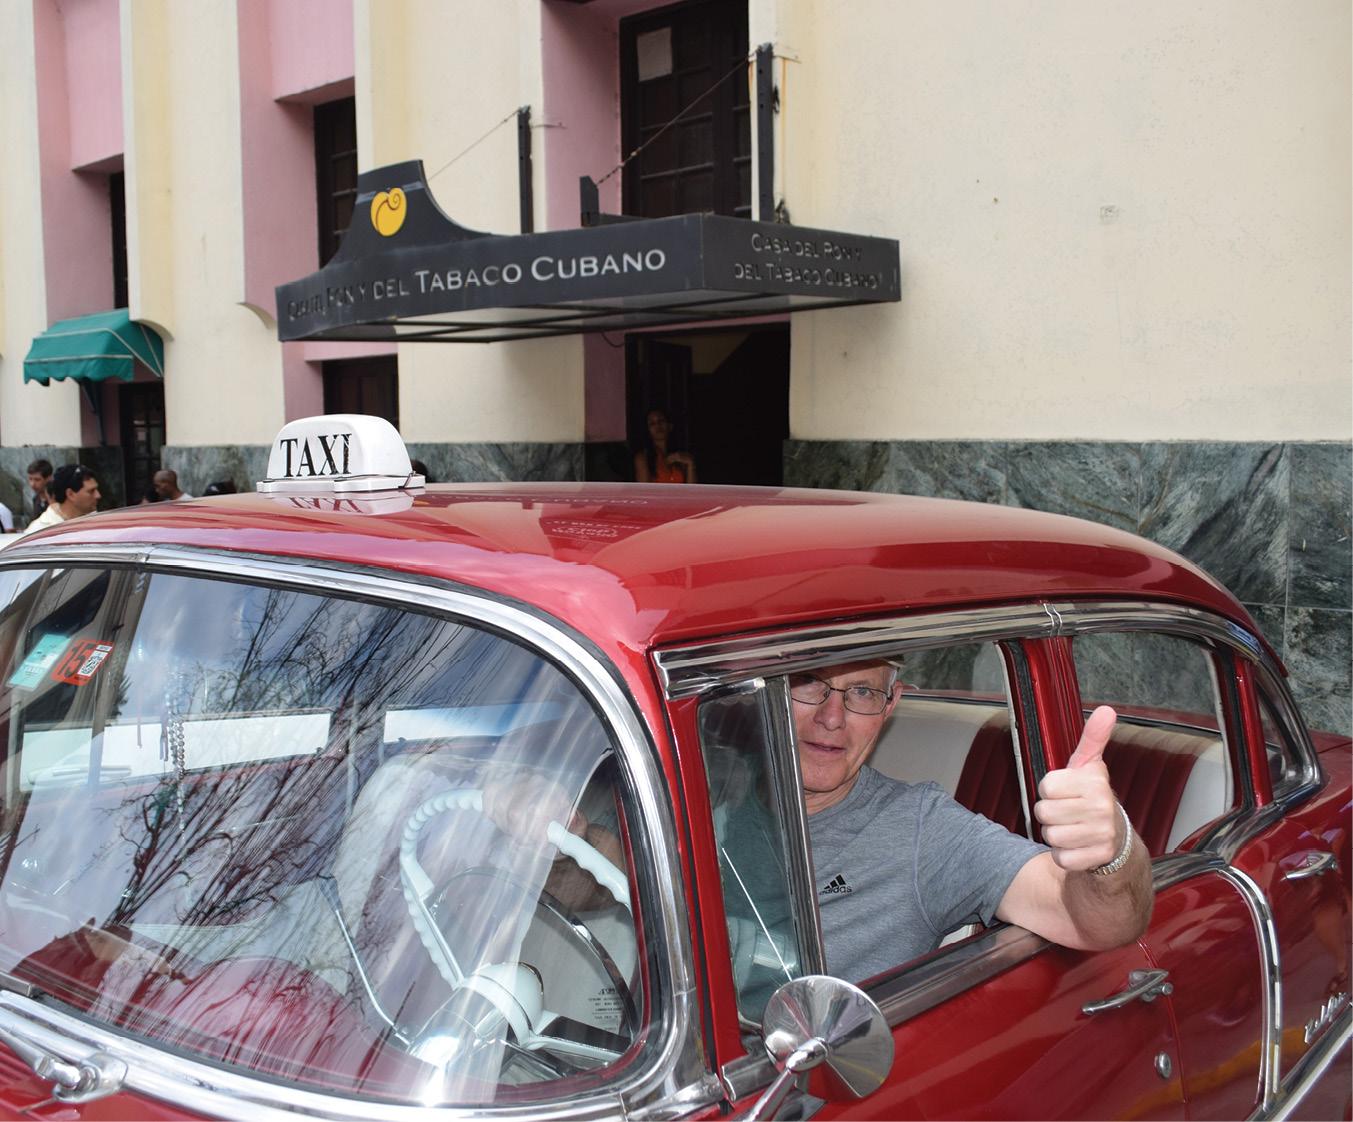 Clair Cramer enjoys a classic car during his Vanderbilt Travel Program trip to Havana, Cuba.